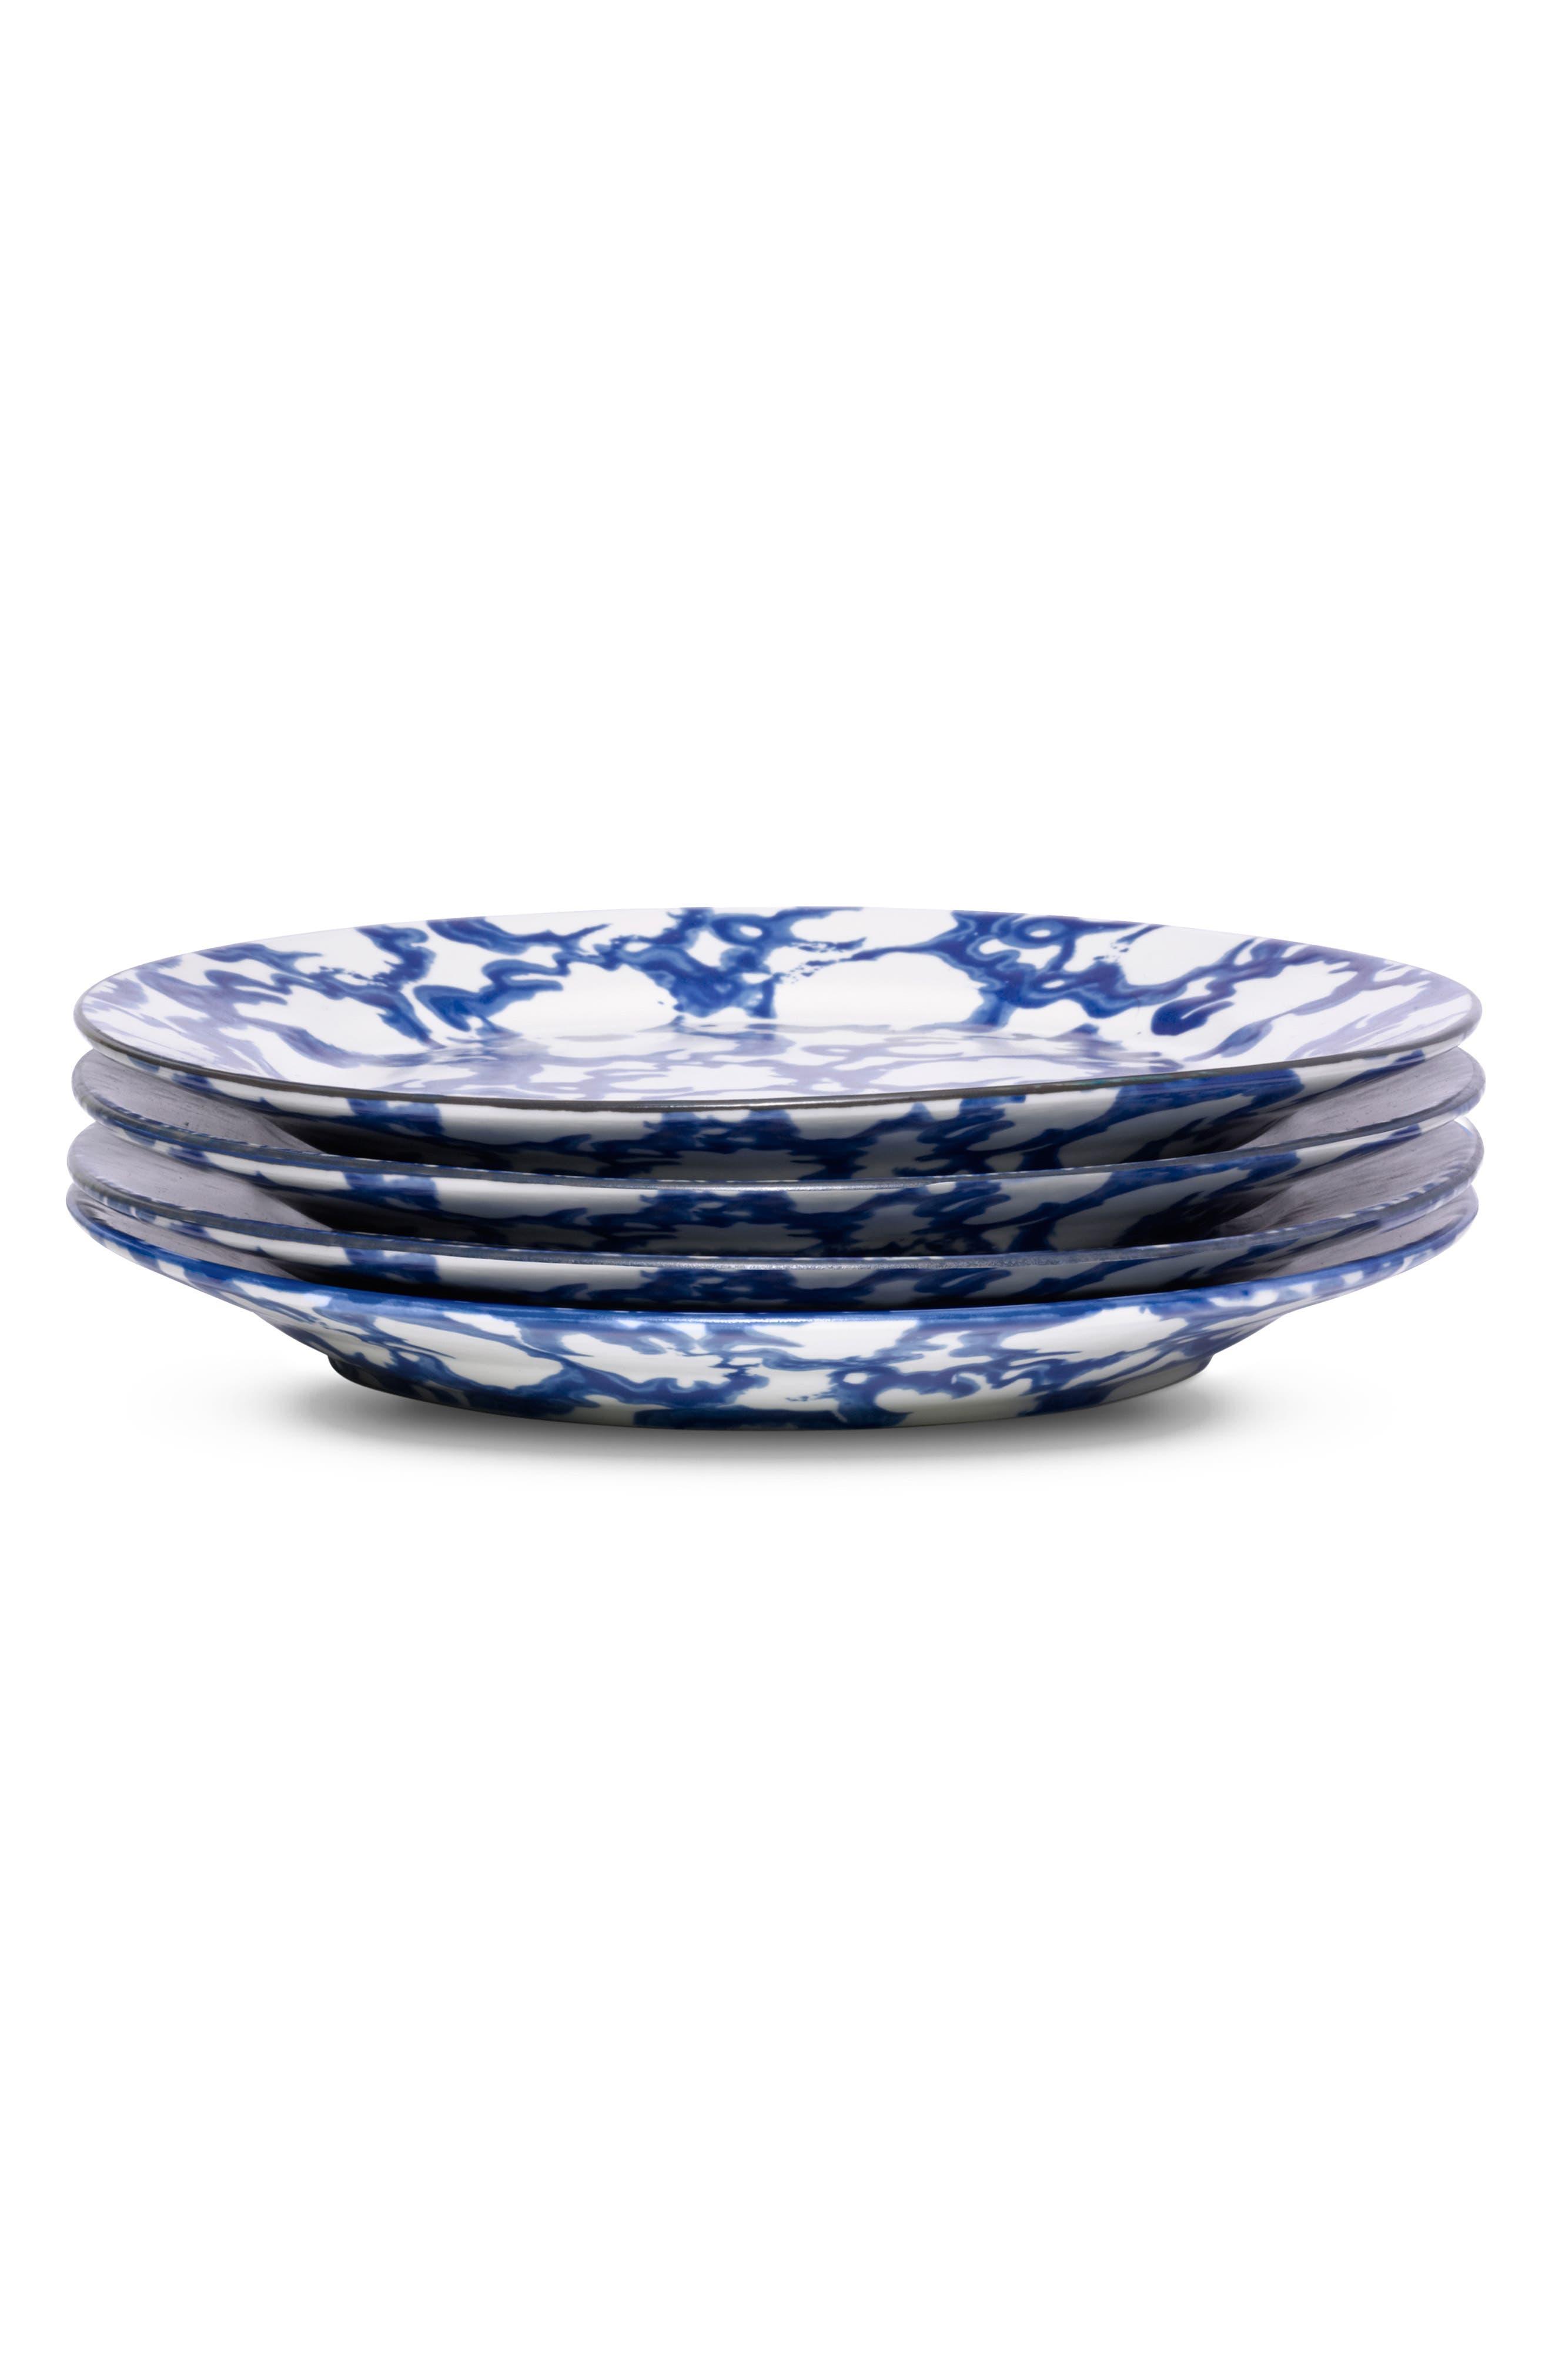 Set of 4 Spongeware Salad Plates,                             Alternate thumbnail 2, color,                             SMOKE RING